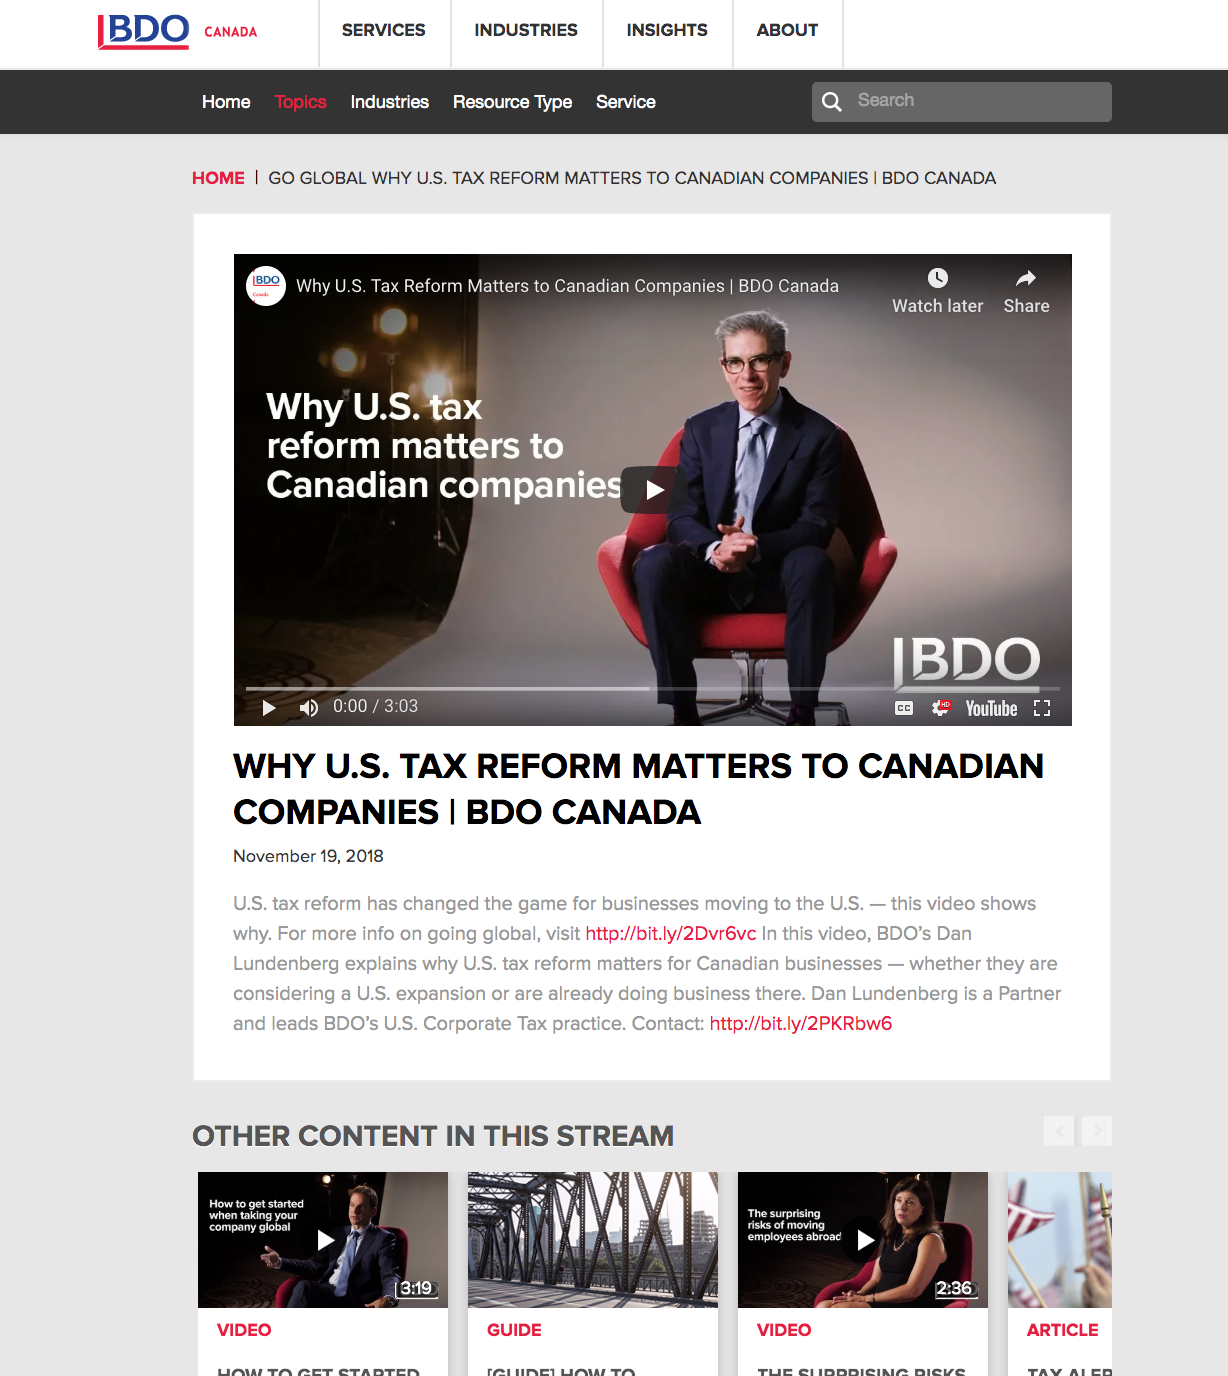 Image of item within BDO Canada's resource hub